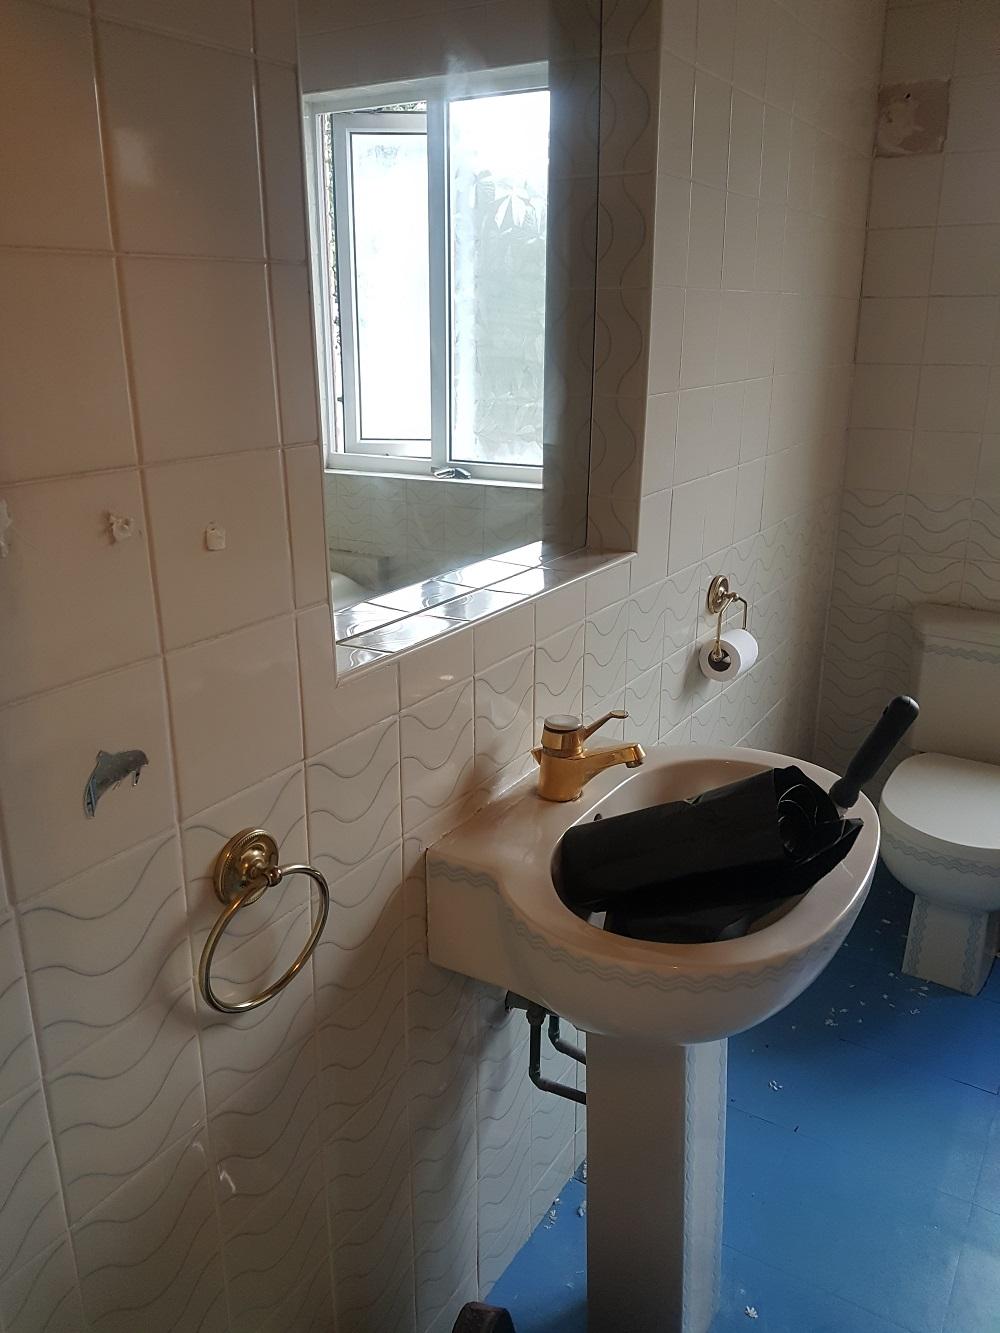 Bathroom Design Before